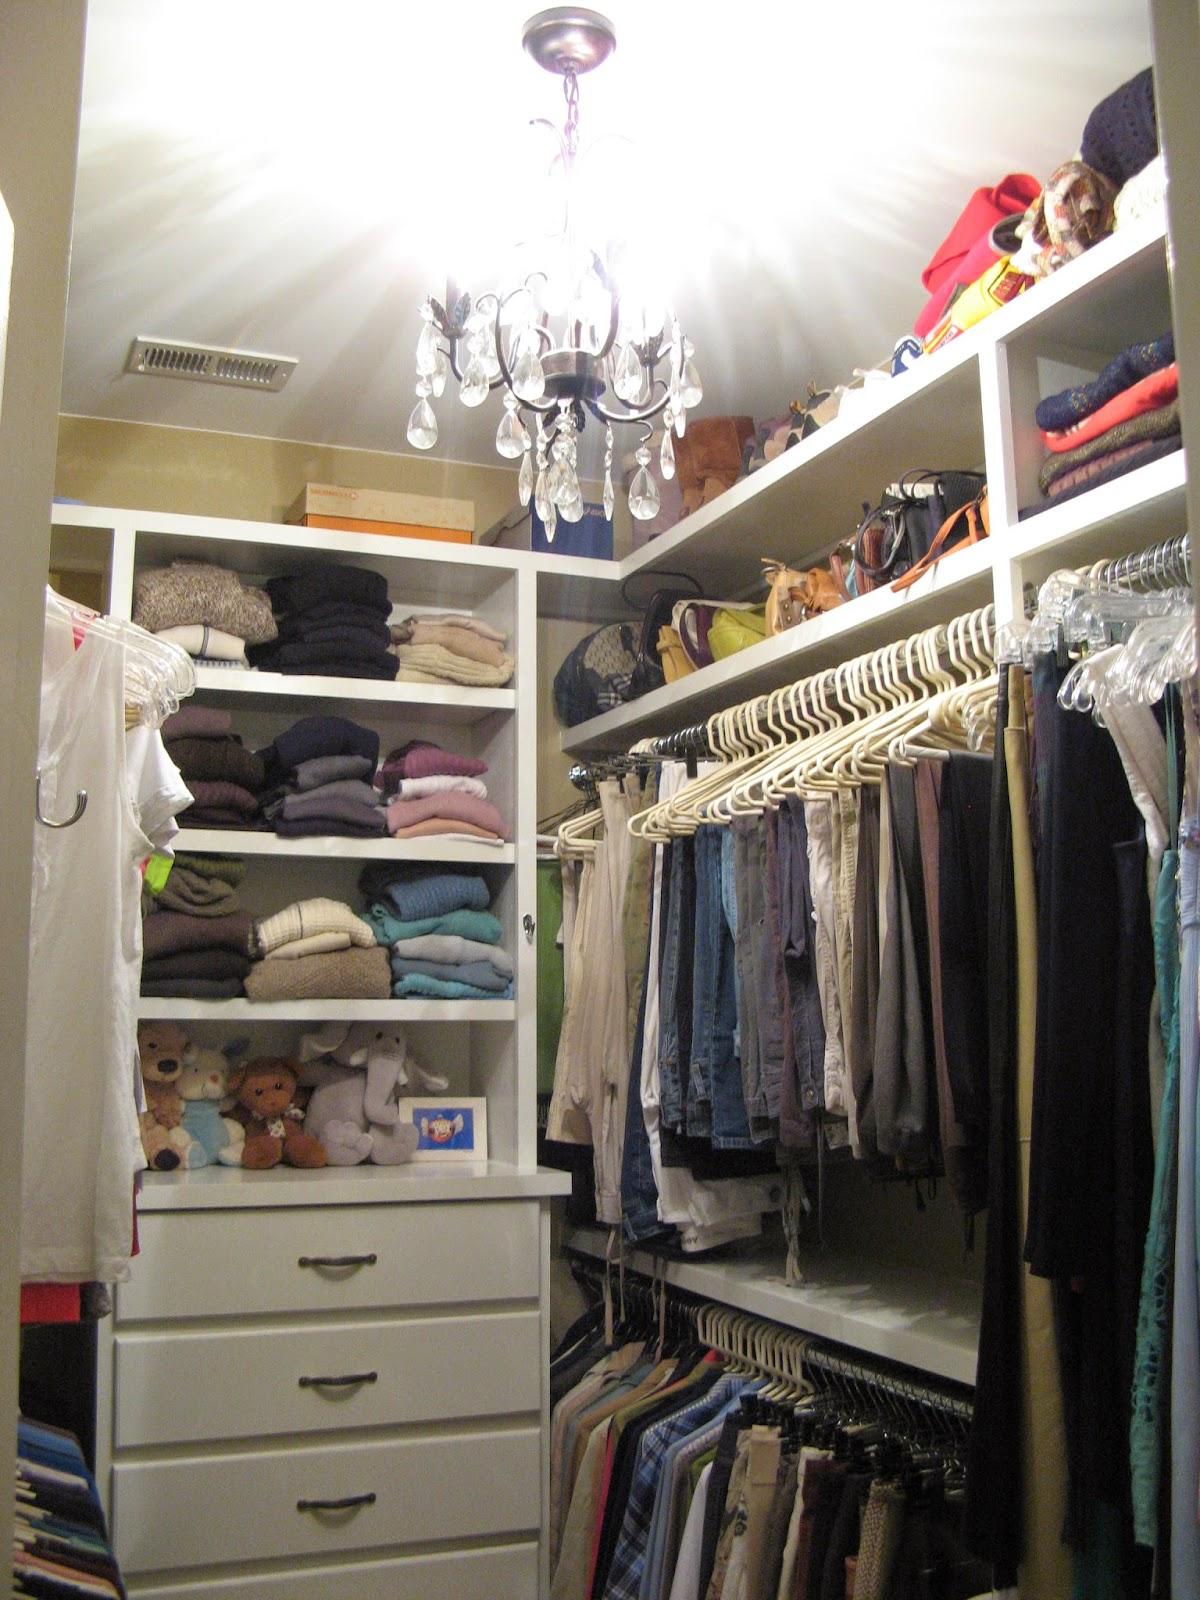 14 Closet Organizing Tips